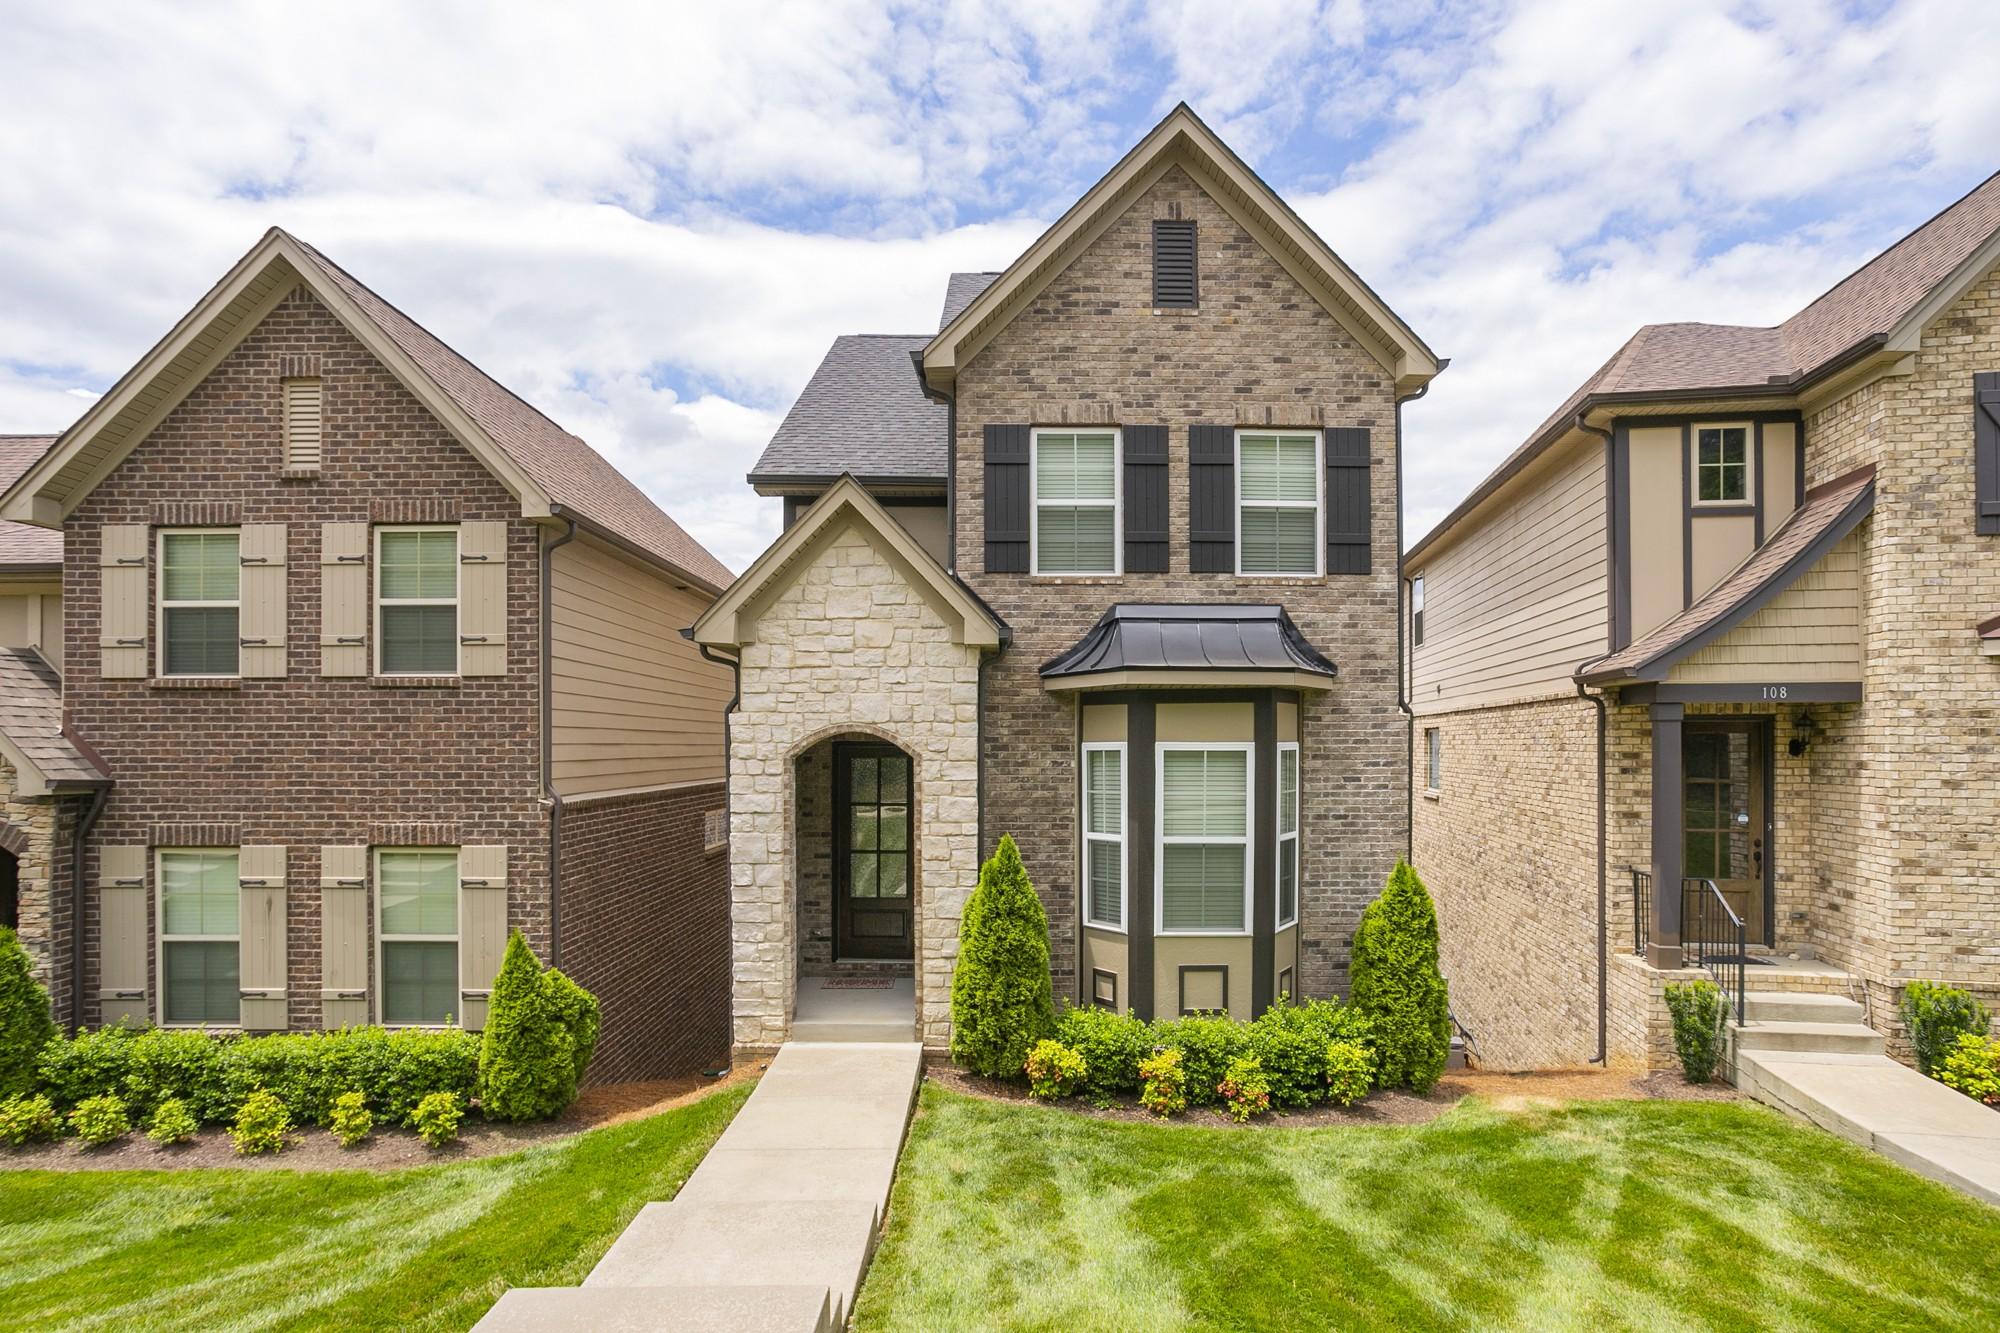 106 Cedar Place Bnd Property Photo - Nashville, TN real estate listing